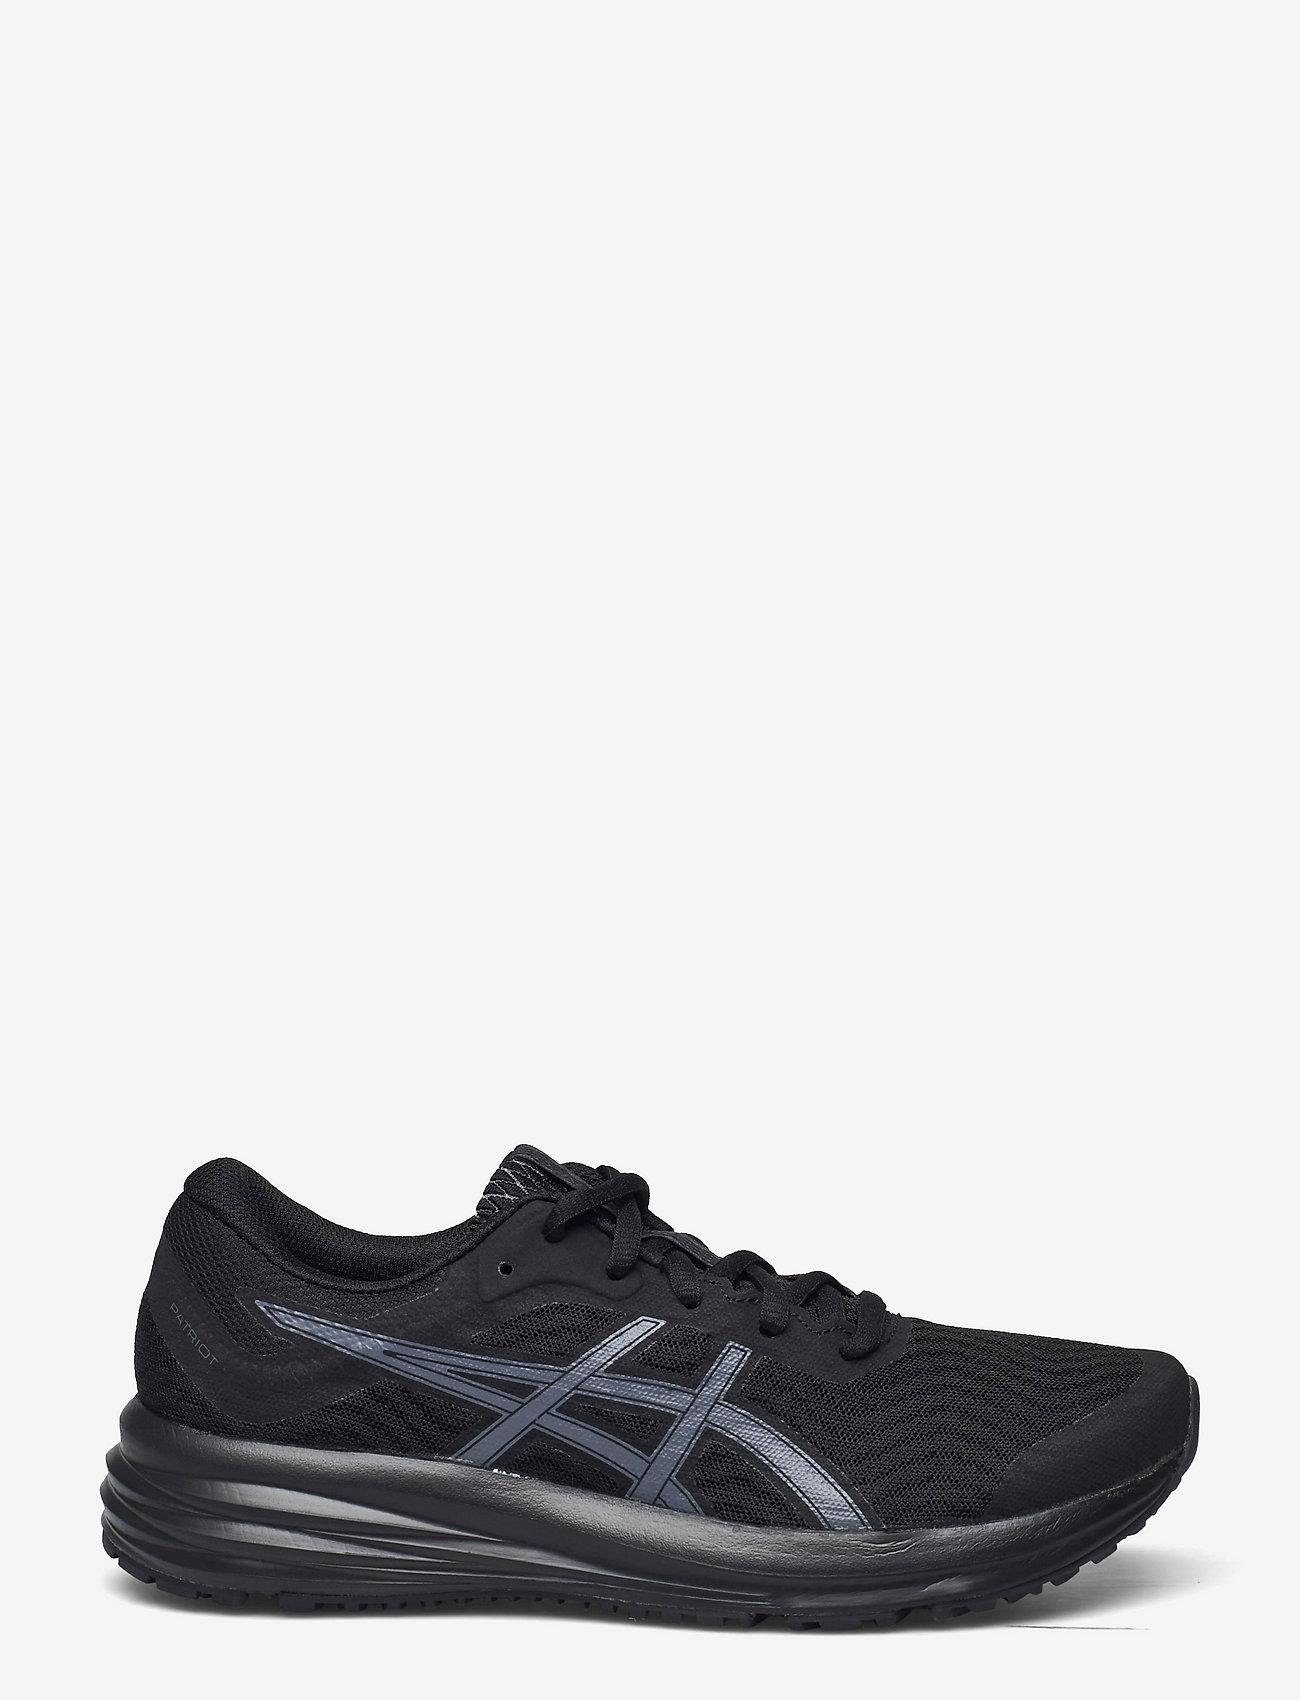 Asics - PATRIOT 12 - running shoes - black/carrier grey - 1